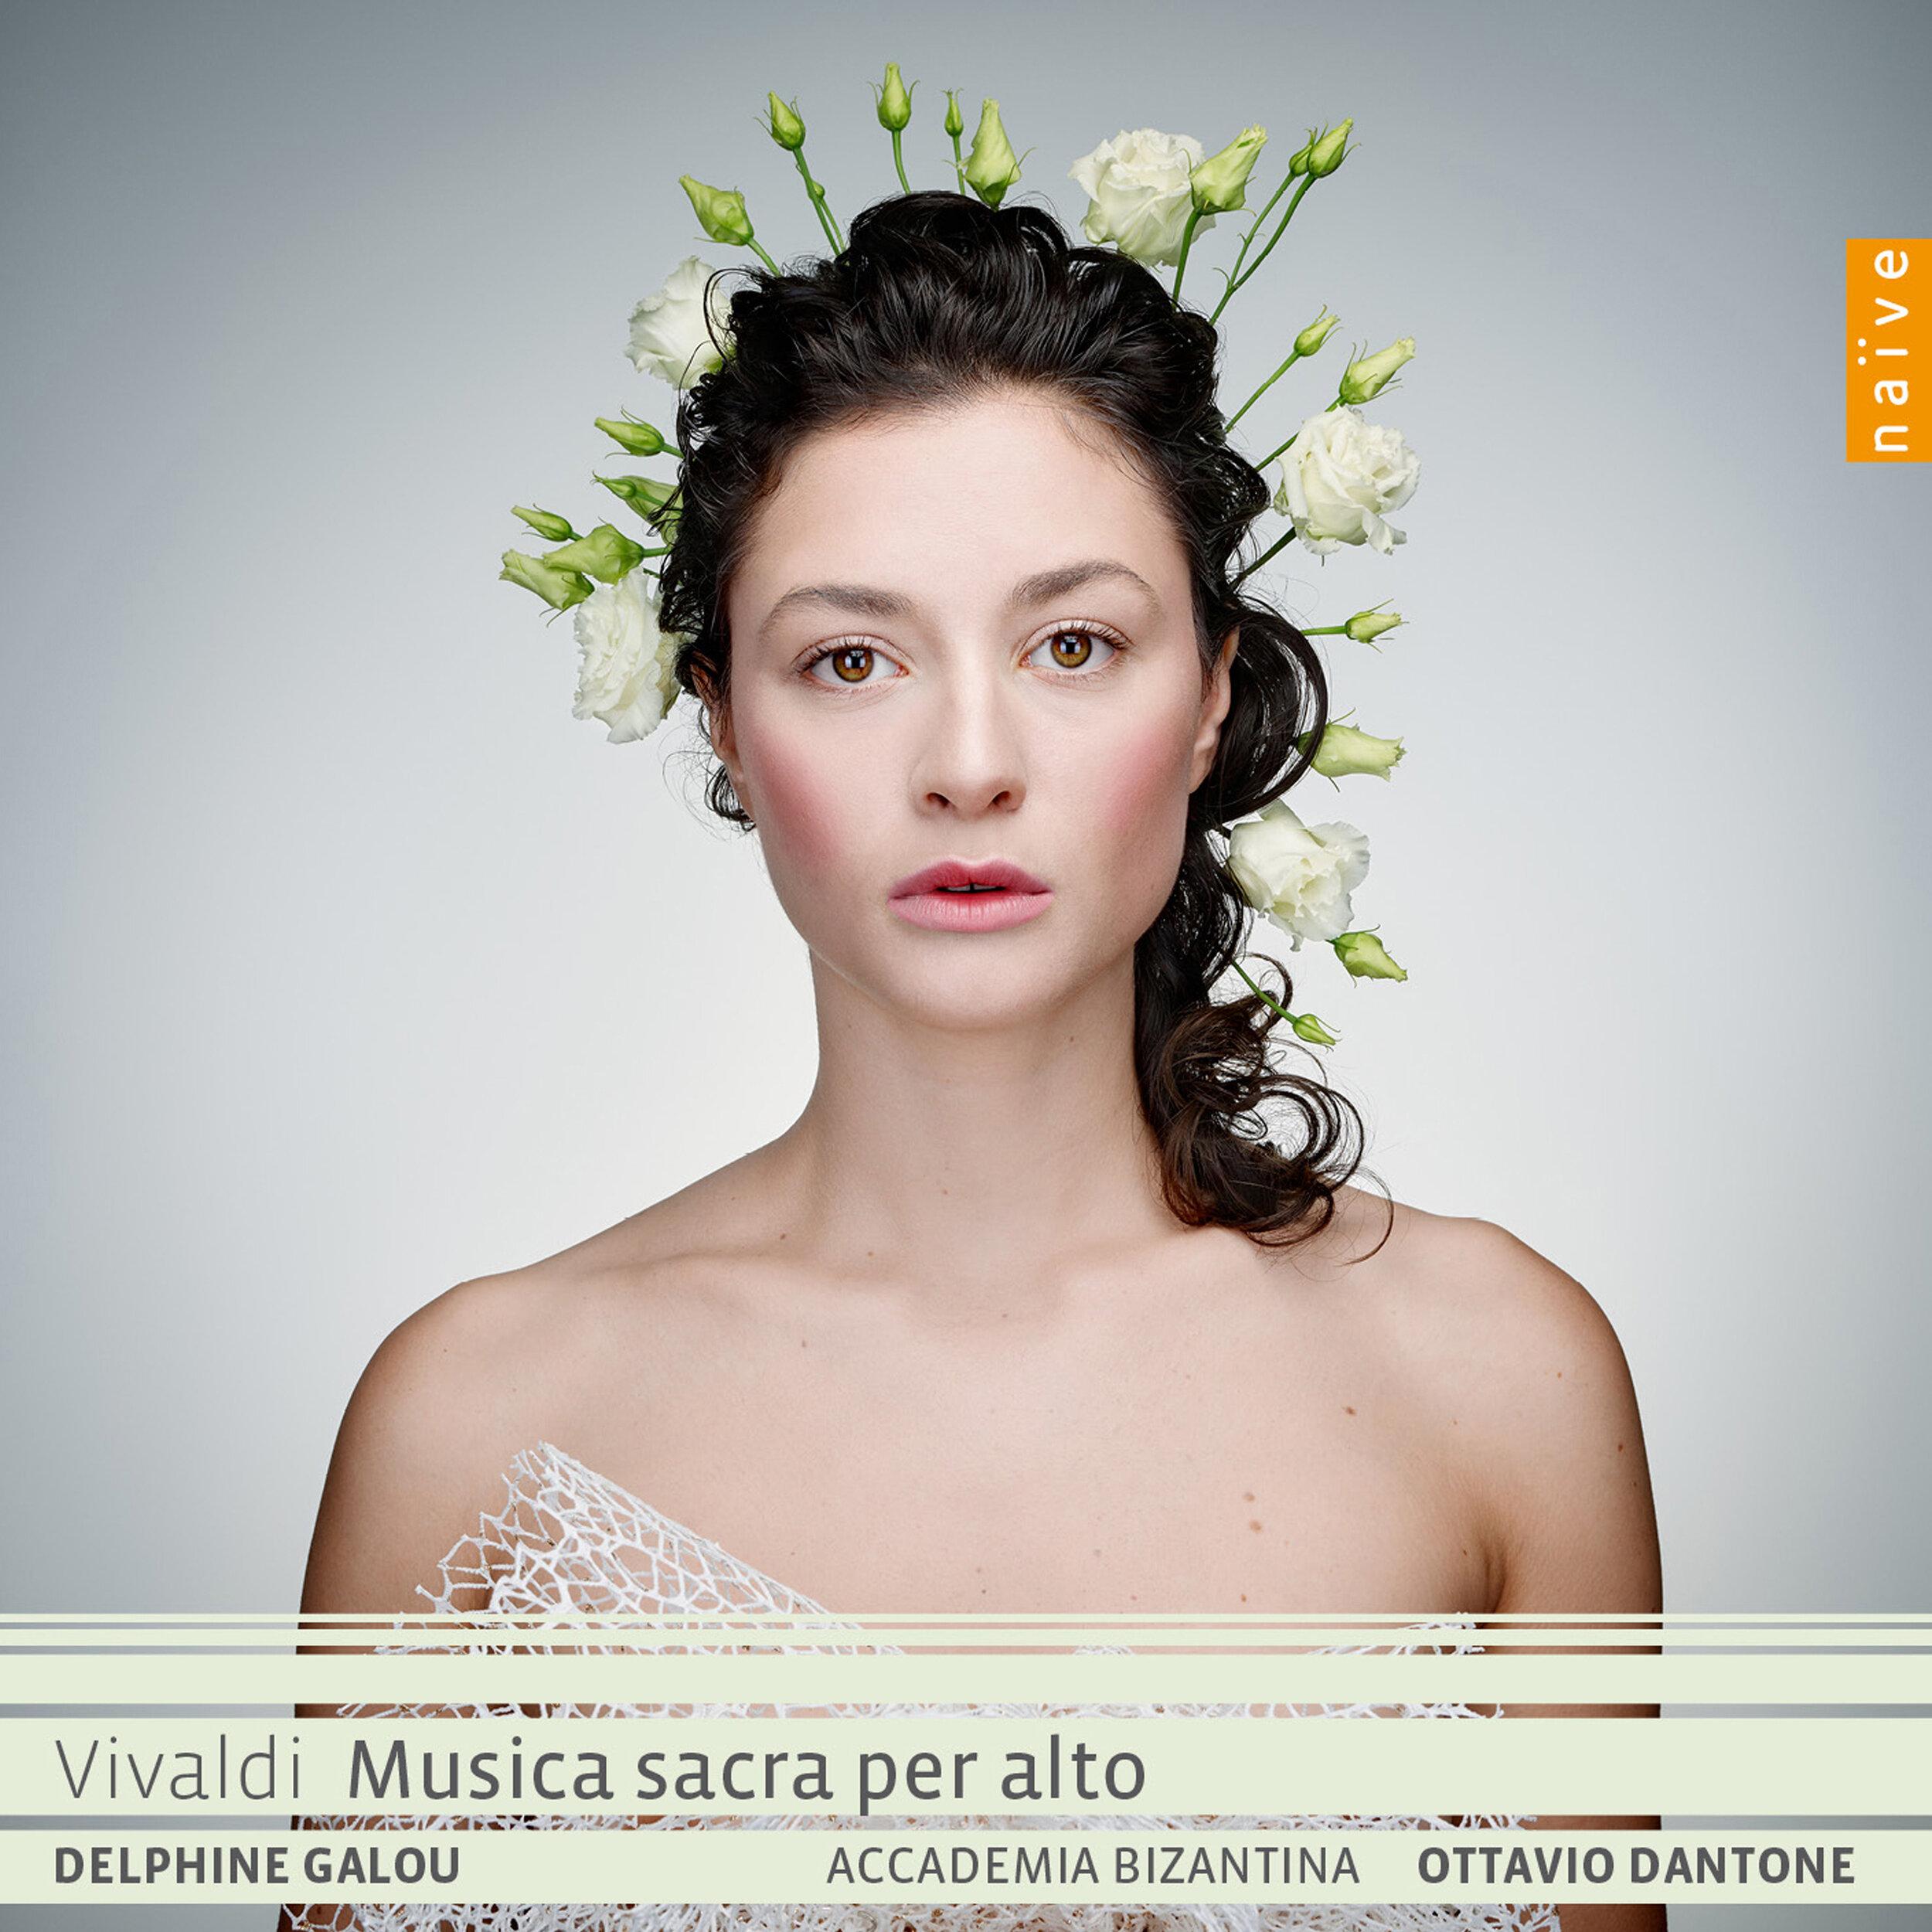 OP30569 K Musica sacra per alto Delphine Galou 3000x3000.jpg